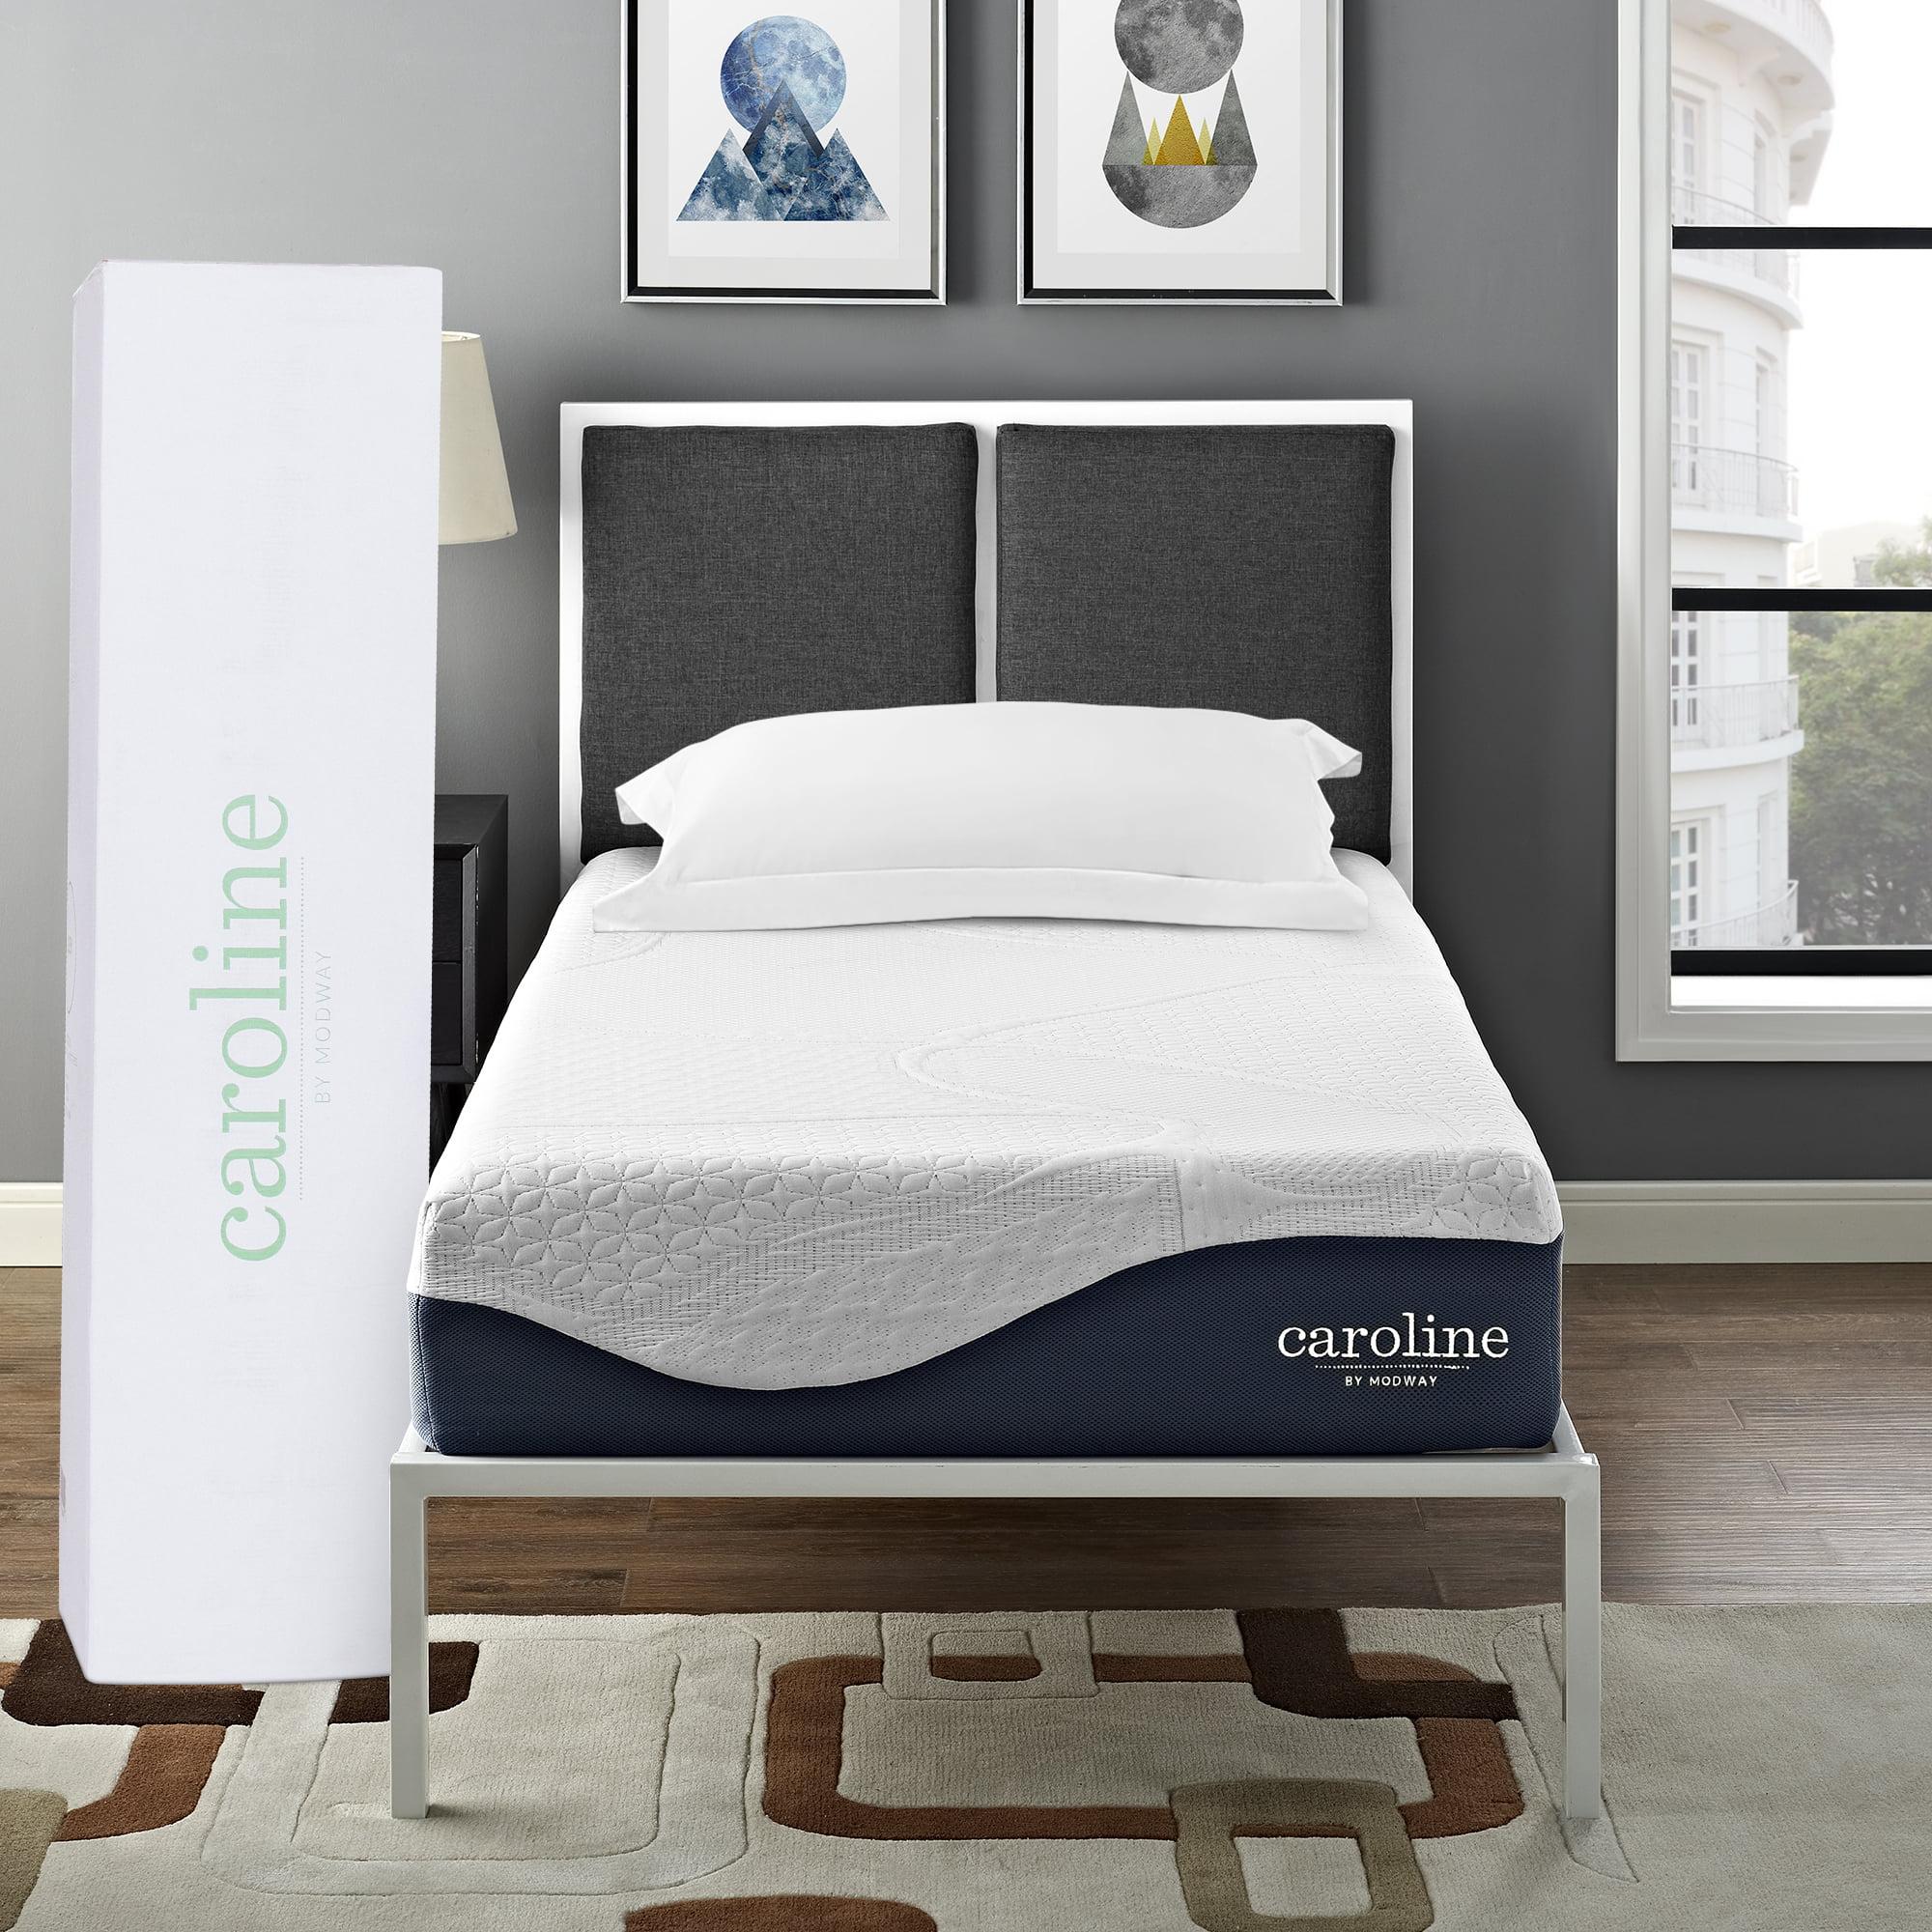 "Modway Caroline 10"" Triple-Layer Memory Foam Mattress, Multiple Sizes"